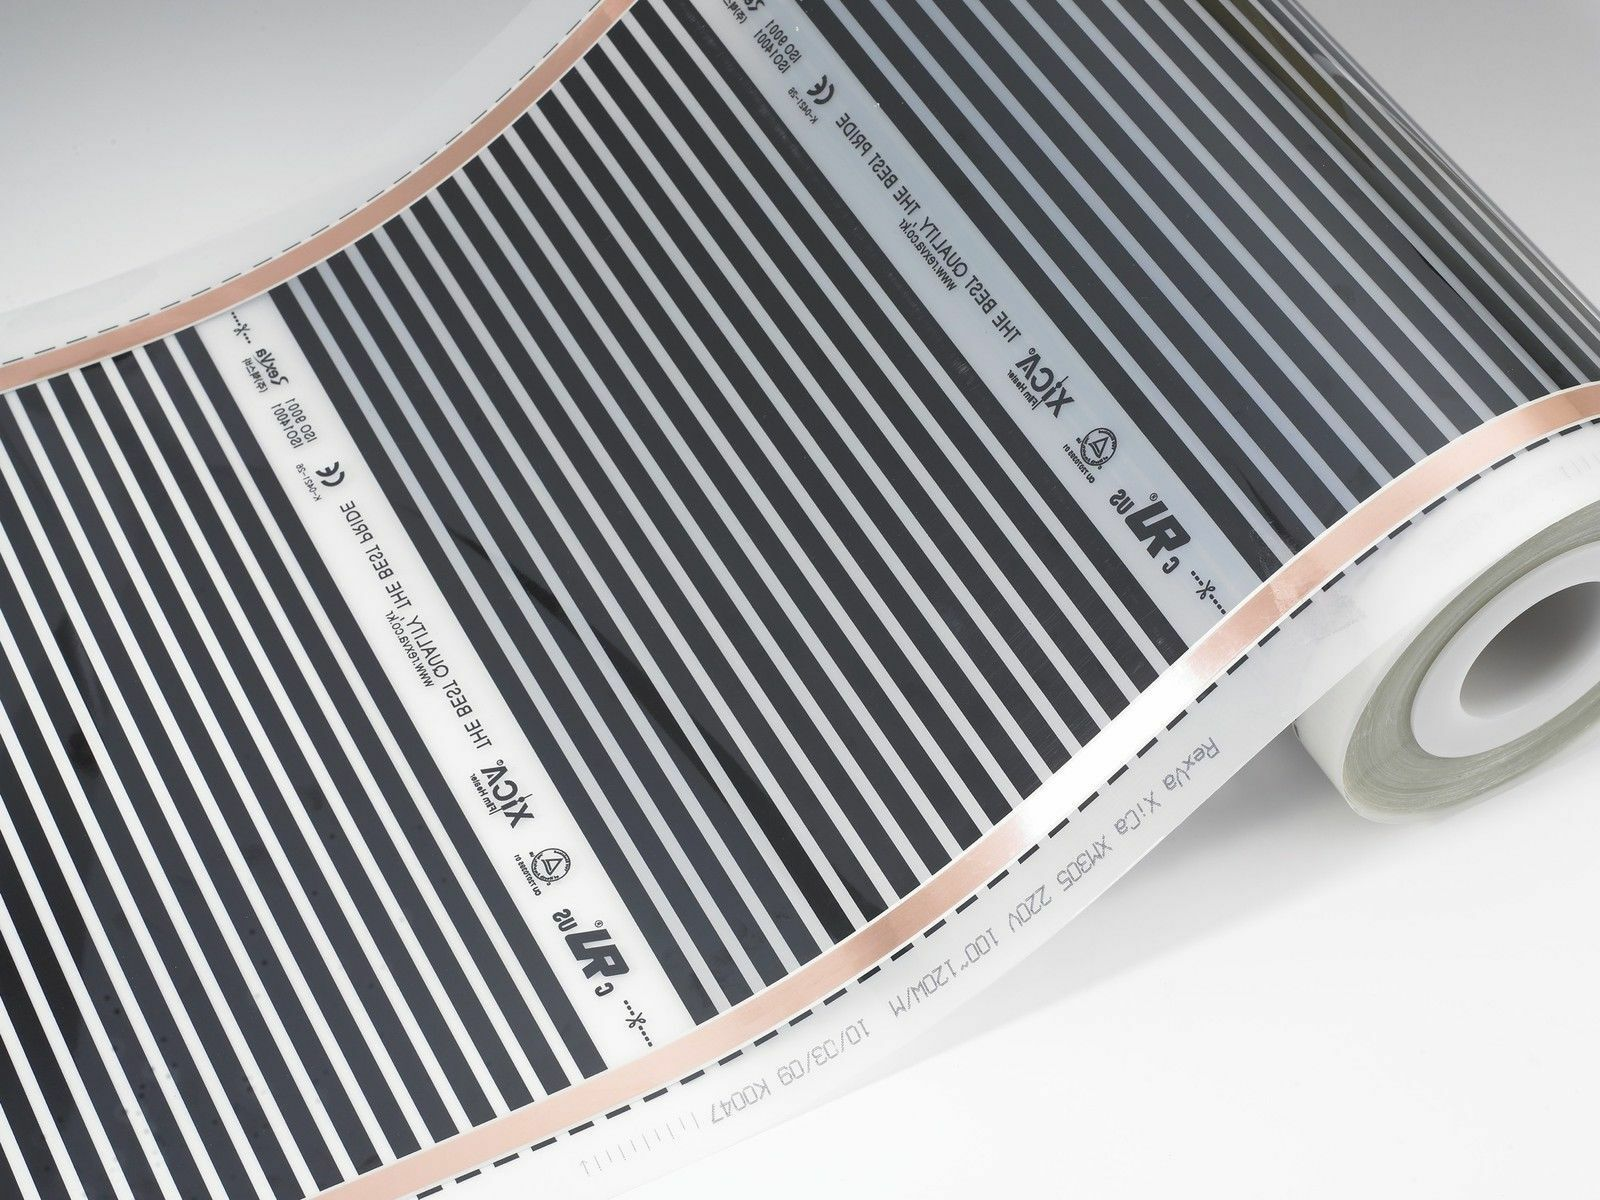 Carbon Warm Floor Heating Film Kit 35 sq ft 120V